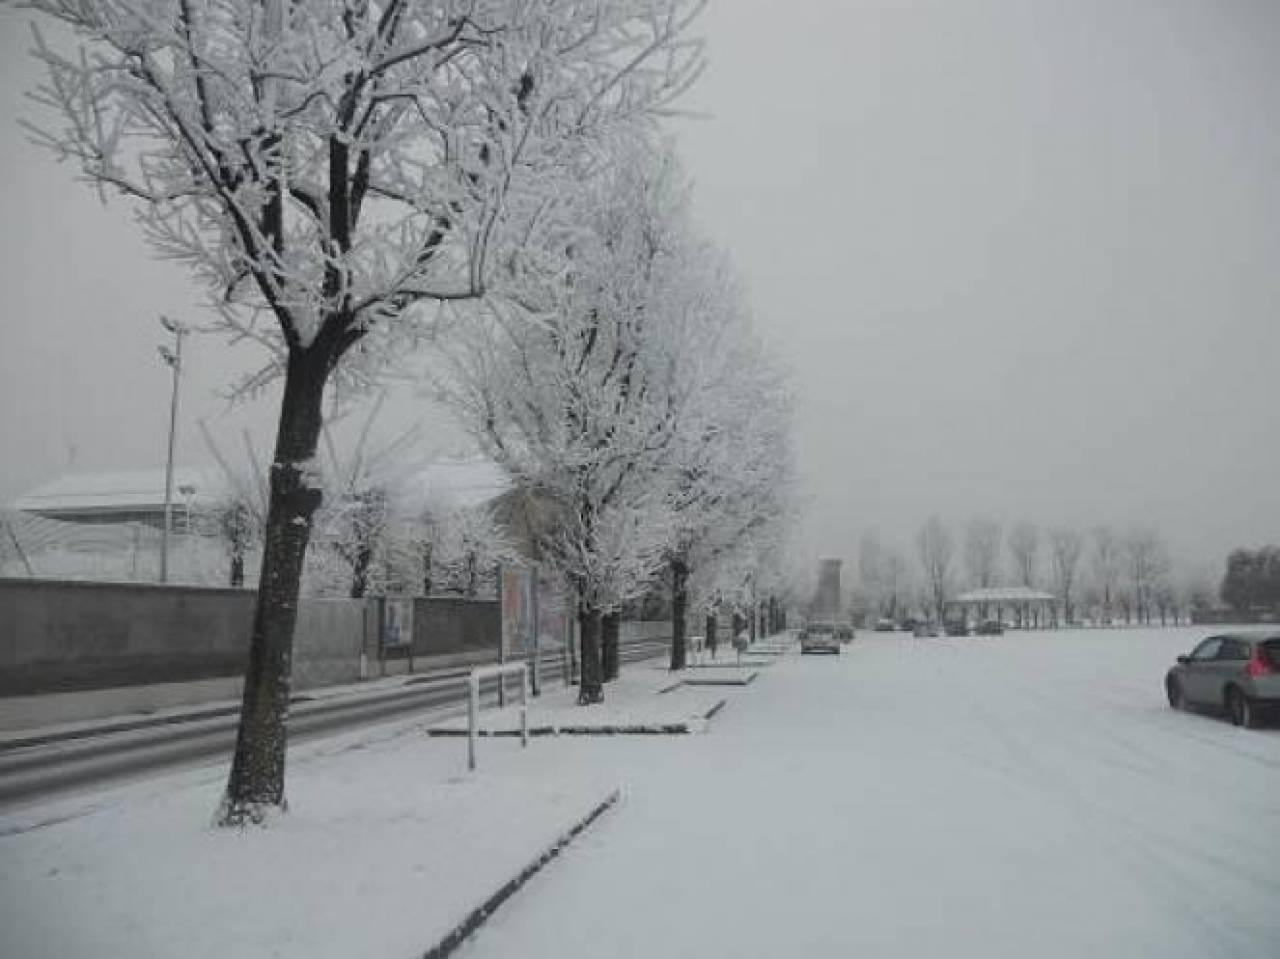 Neve chimica in Val Padana in un'immagine di archivio